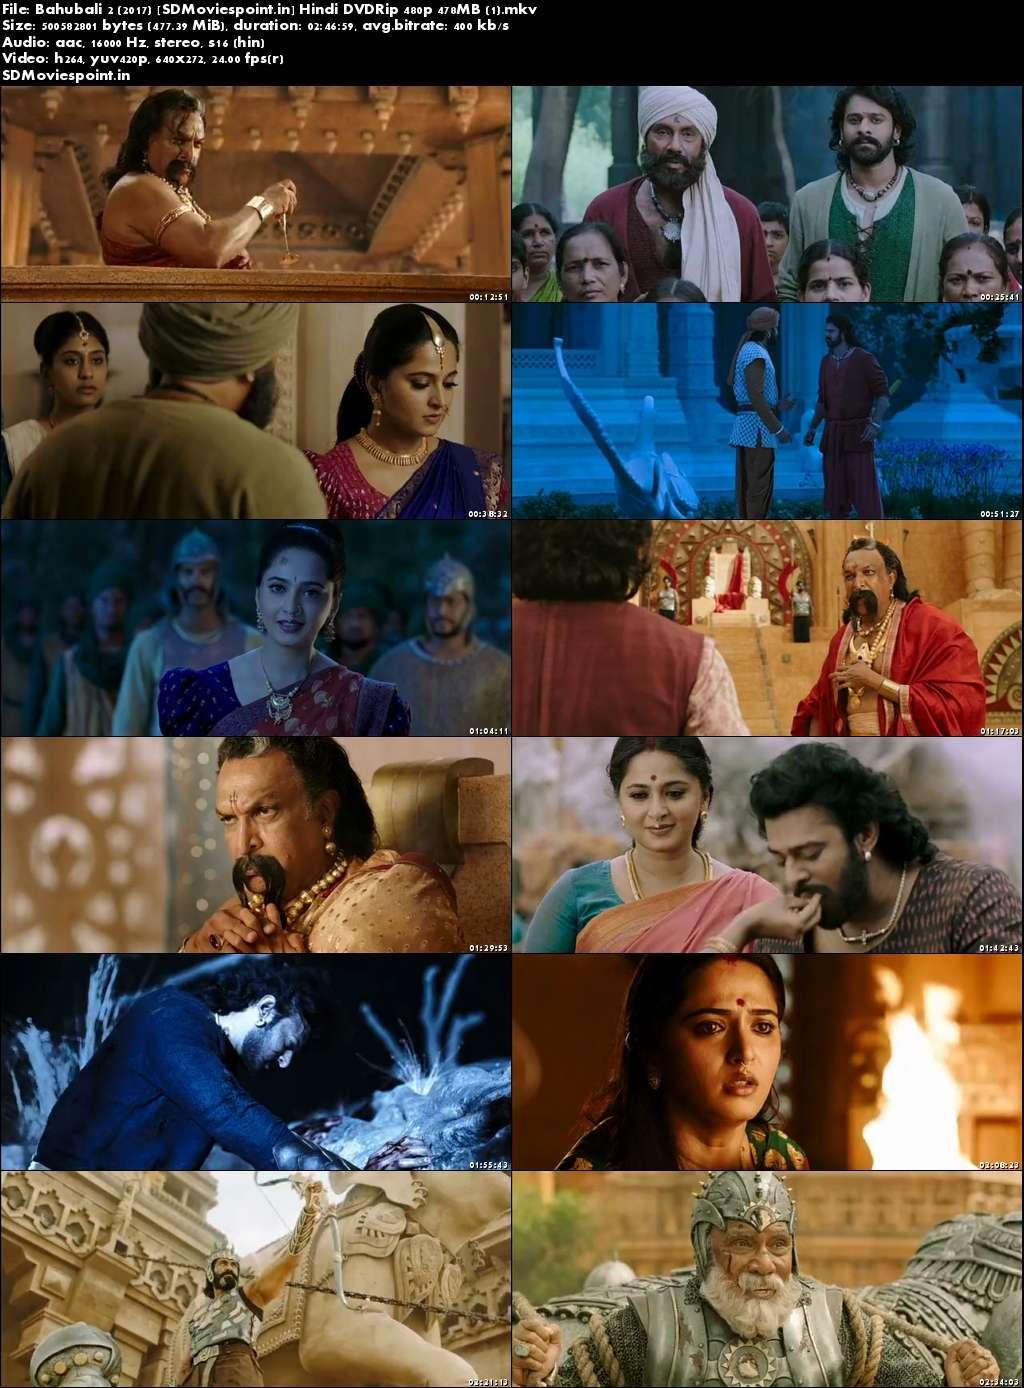 Screen Shots Baahubali 2 (2017) Full HD Movie Download Dual Audio Hindi Free 400MB